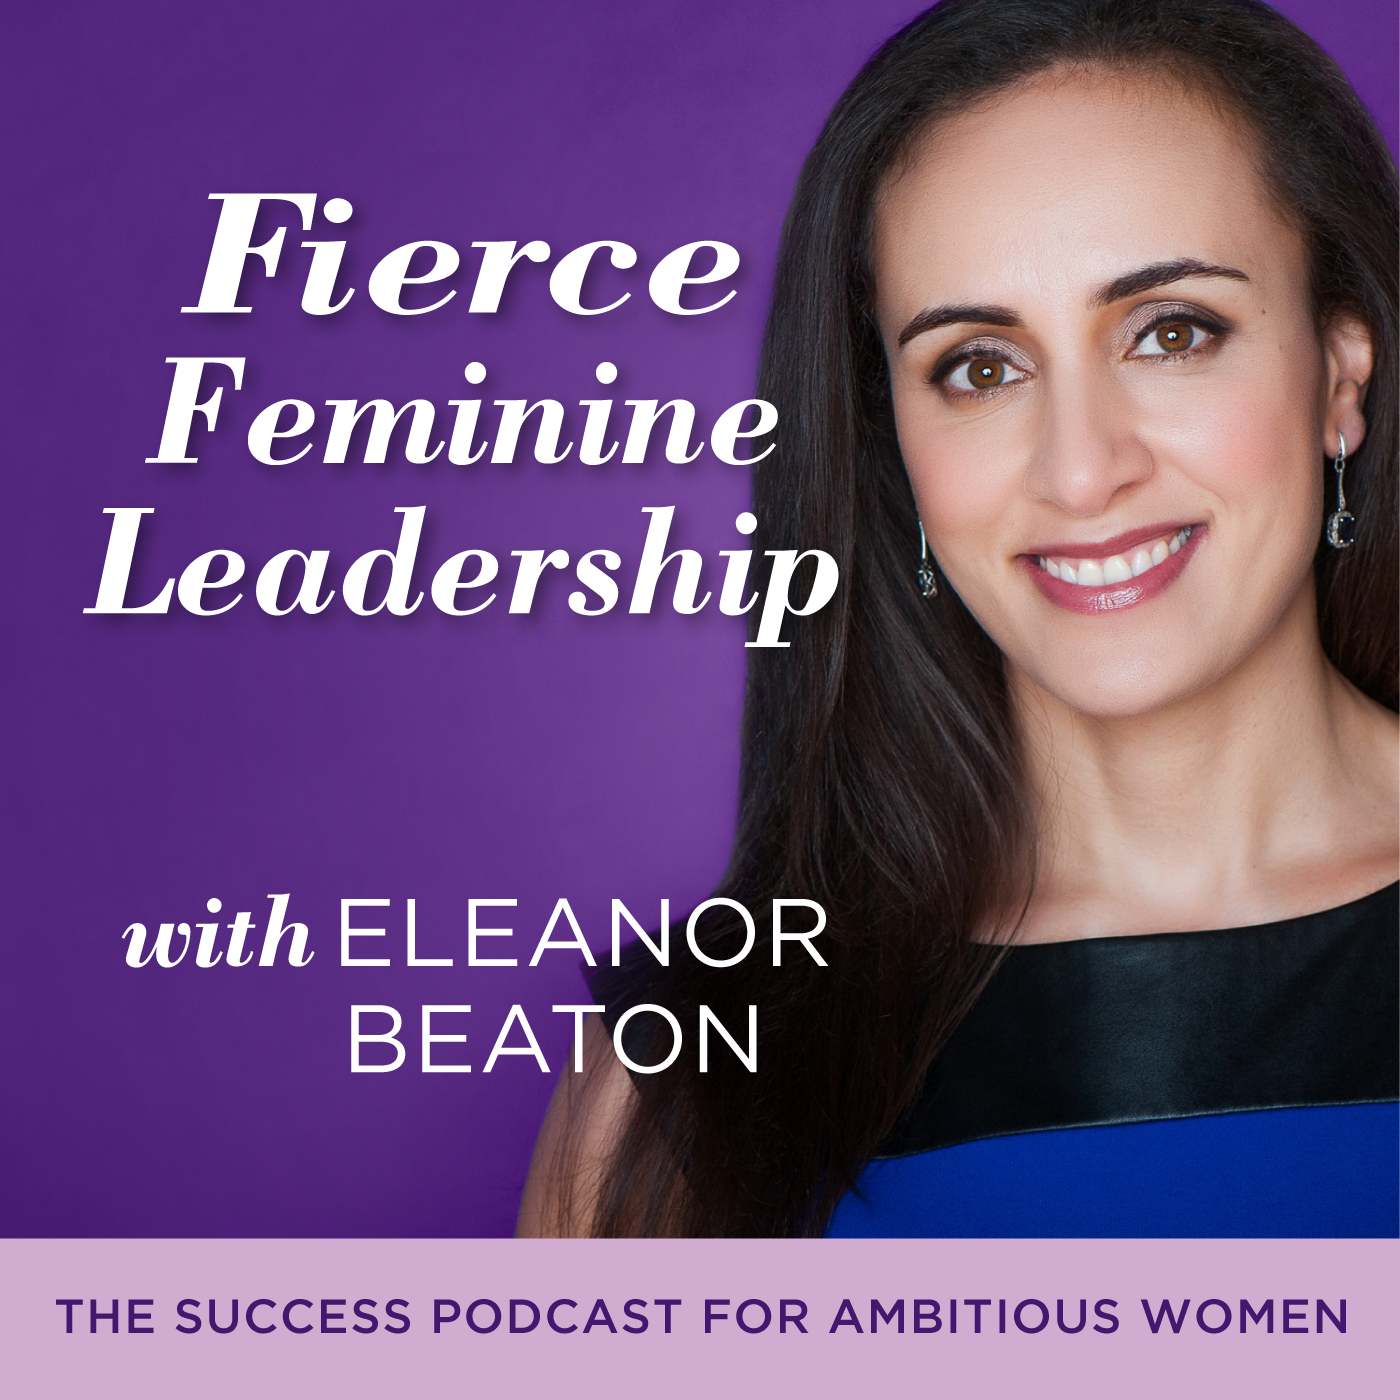 Fierce_Feminine_Leadership_Podcast_with_Eleanor_Beaton